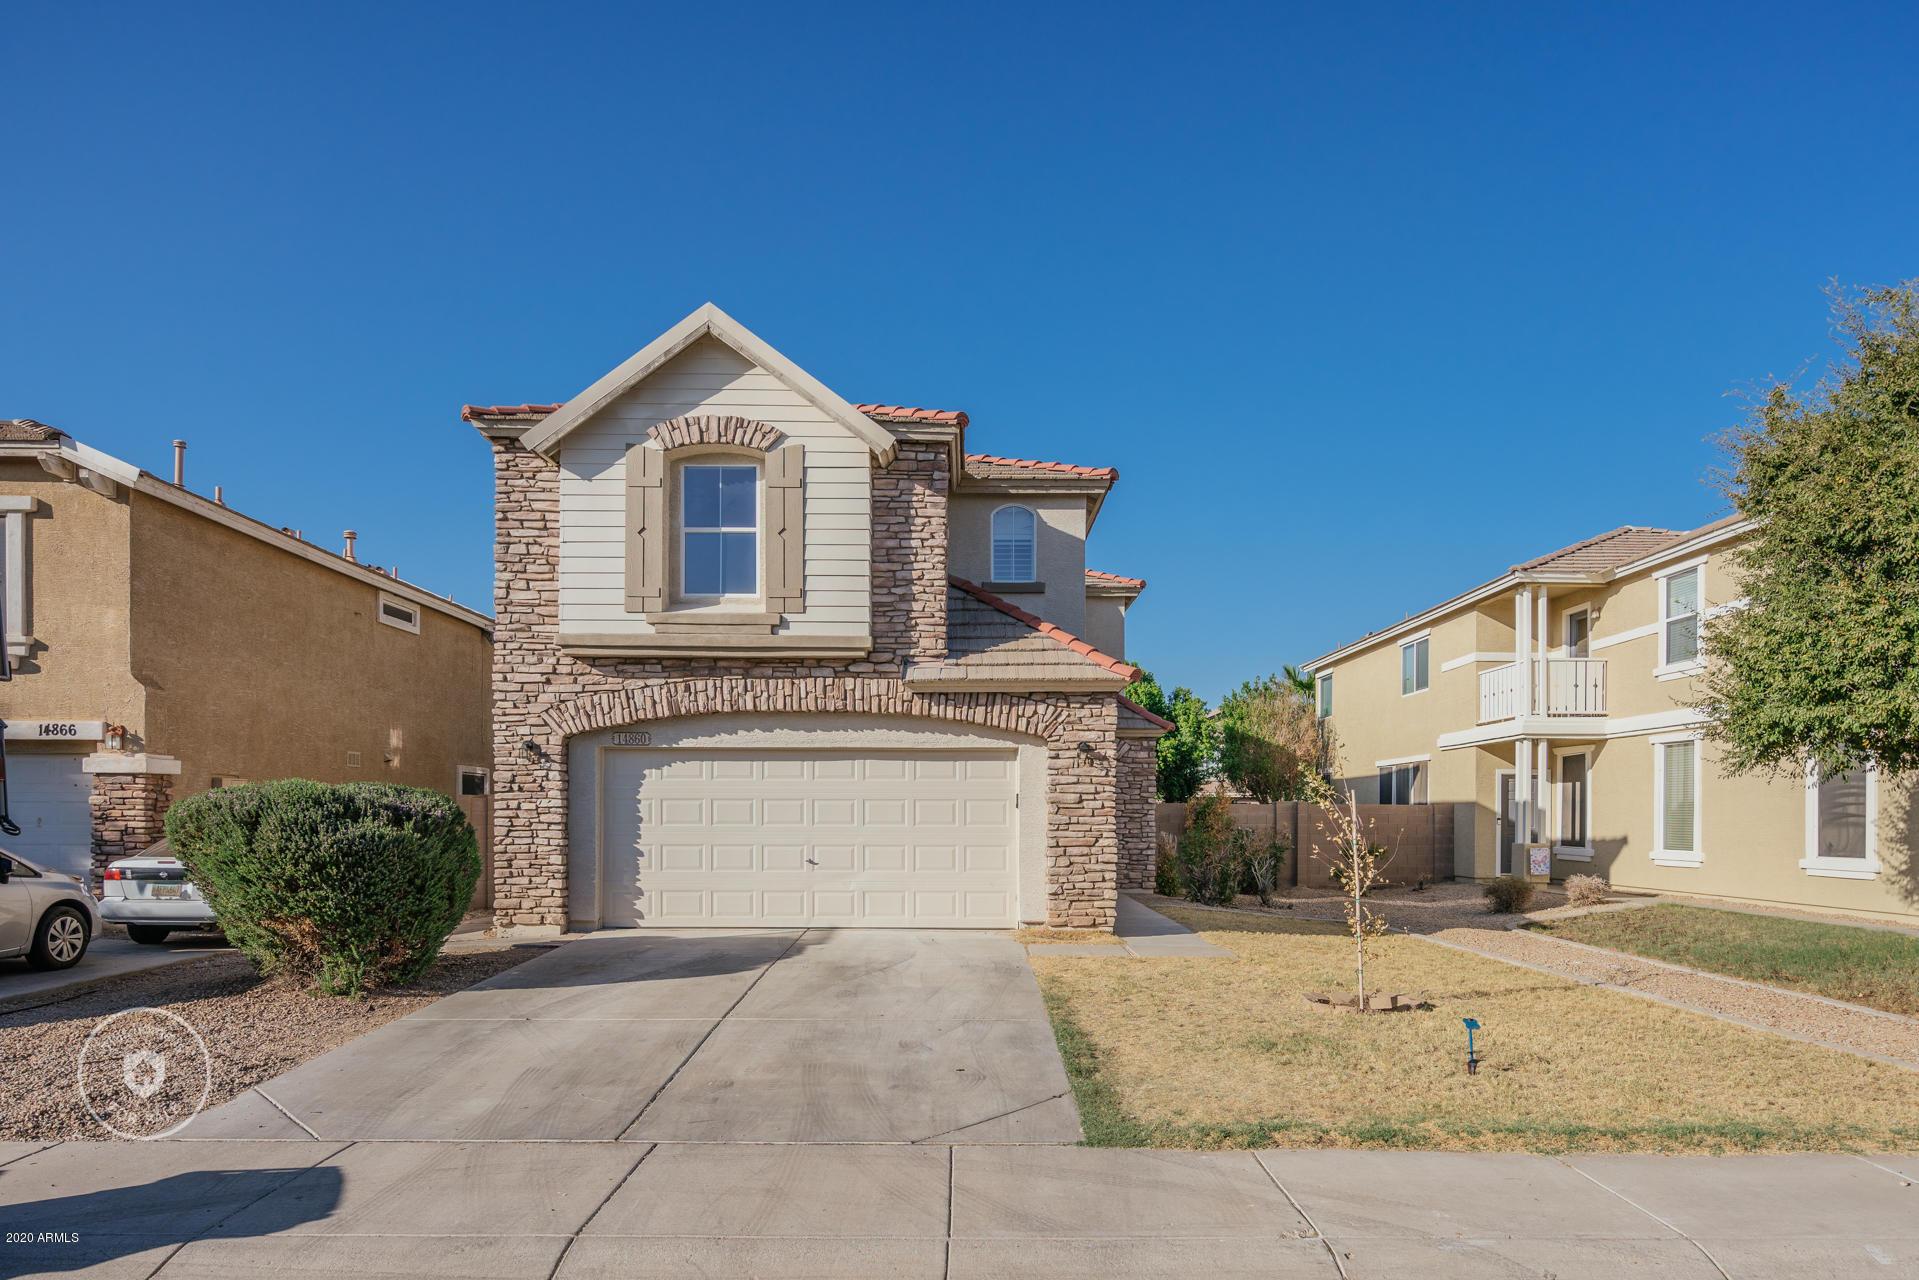 MLS 6145898 14860 W BLOOMFIELD Road, Surprise, AZ 85379 Surprise AZ Rancho Gabriela